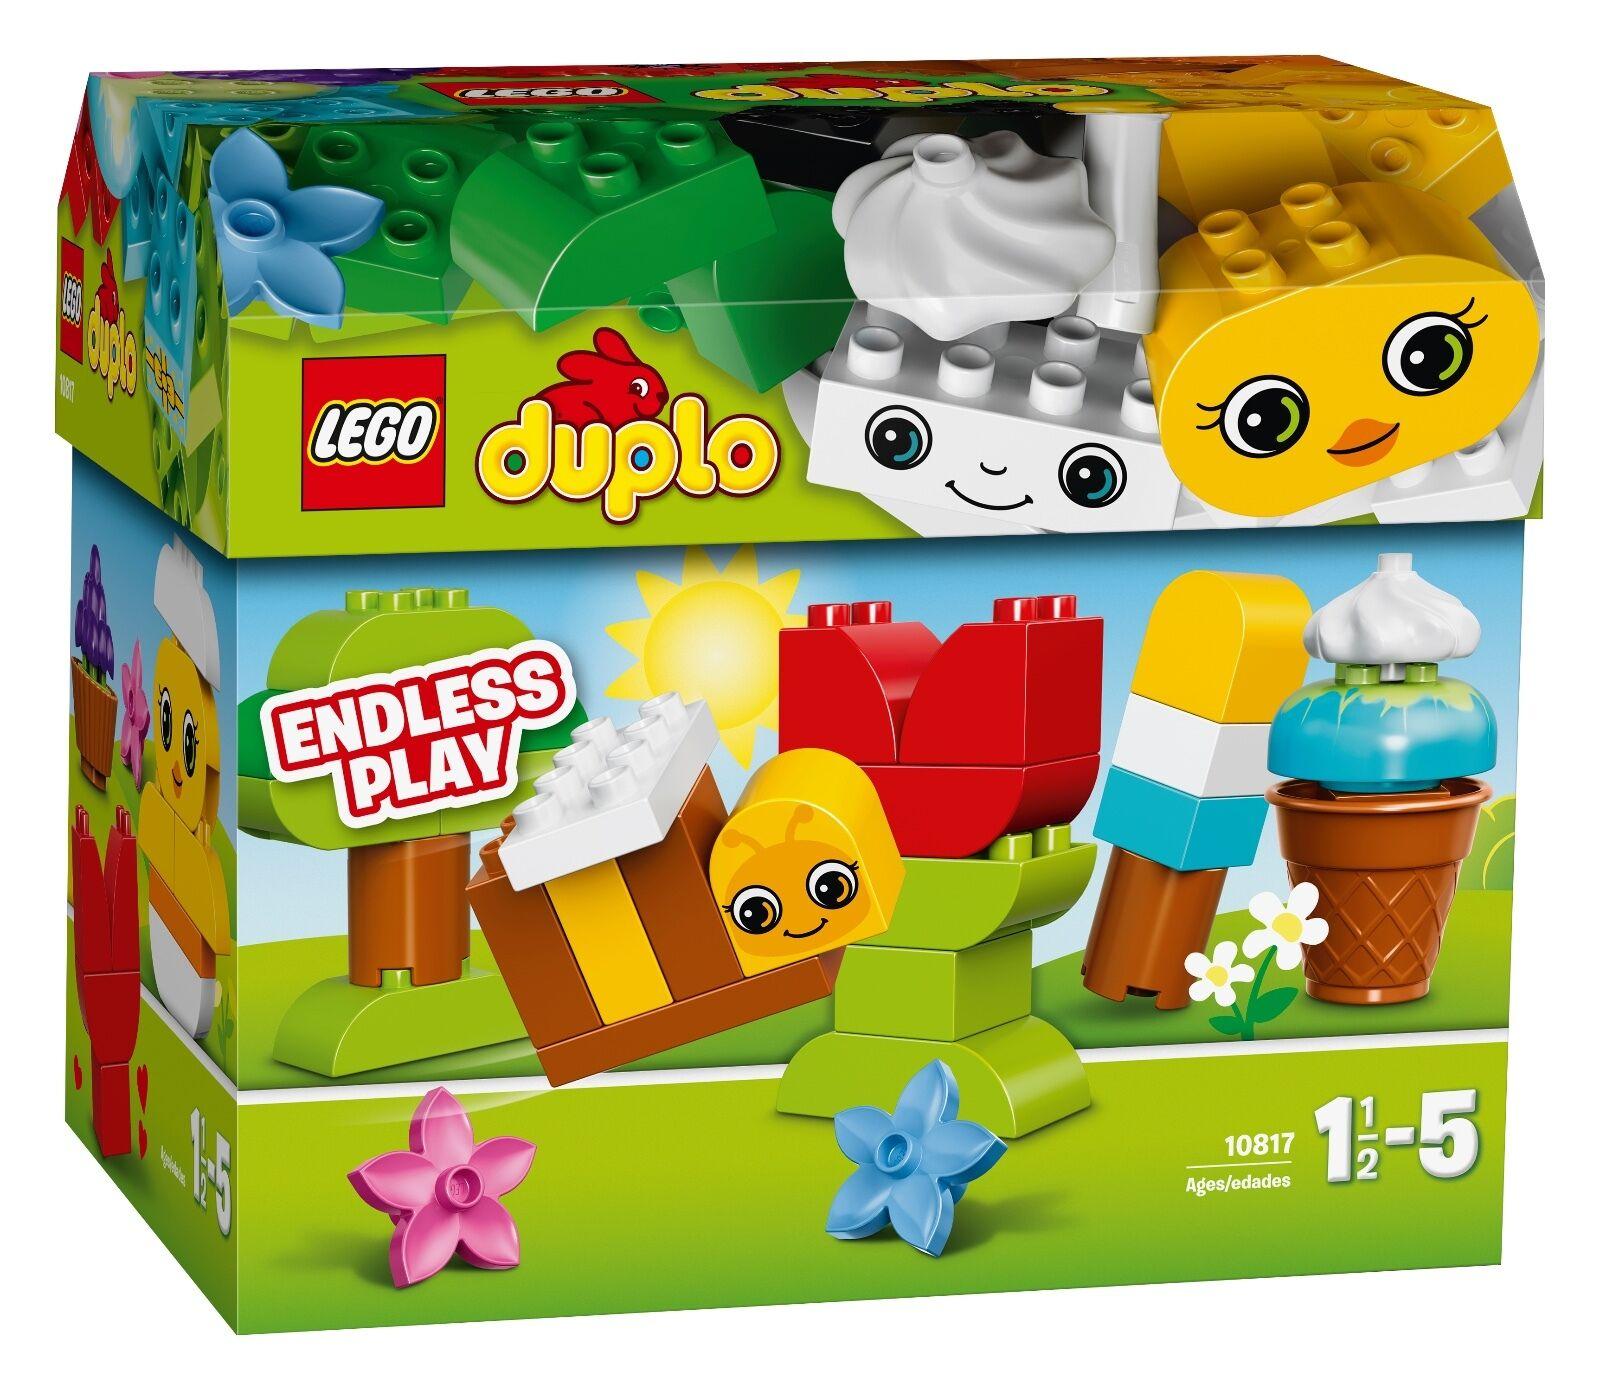 LEGO® DUPLO® DUPLO® DUPLO® 10817 Kreatives Bauset NEU OVP_ Creative Chest NEW MISB NRFB 2526c4